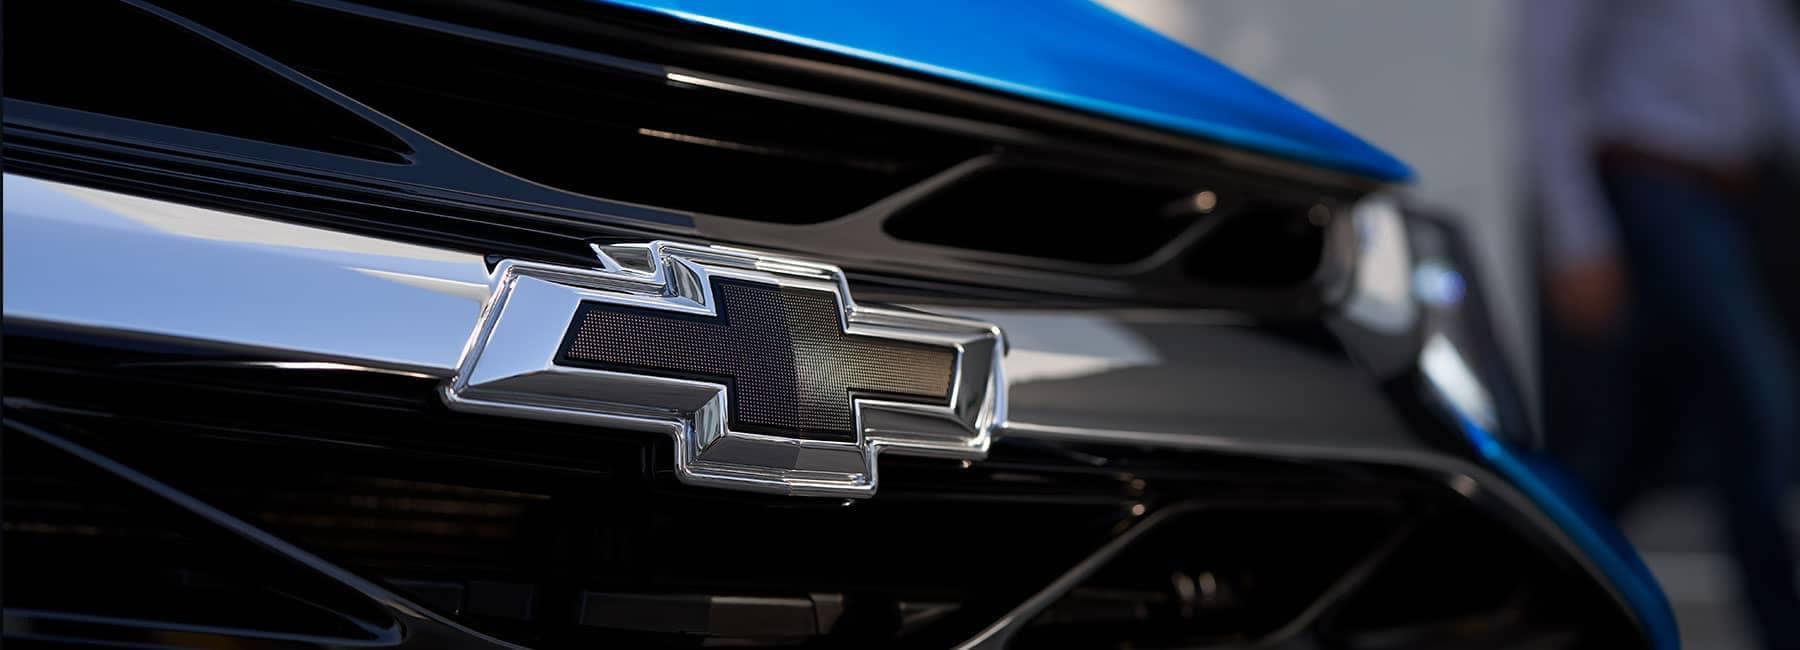 2019 Blue Chevrolet Cruze Exterior Grille